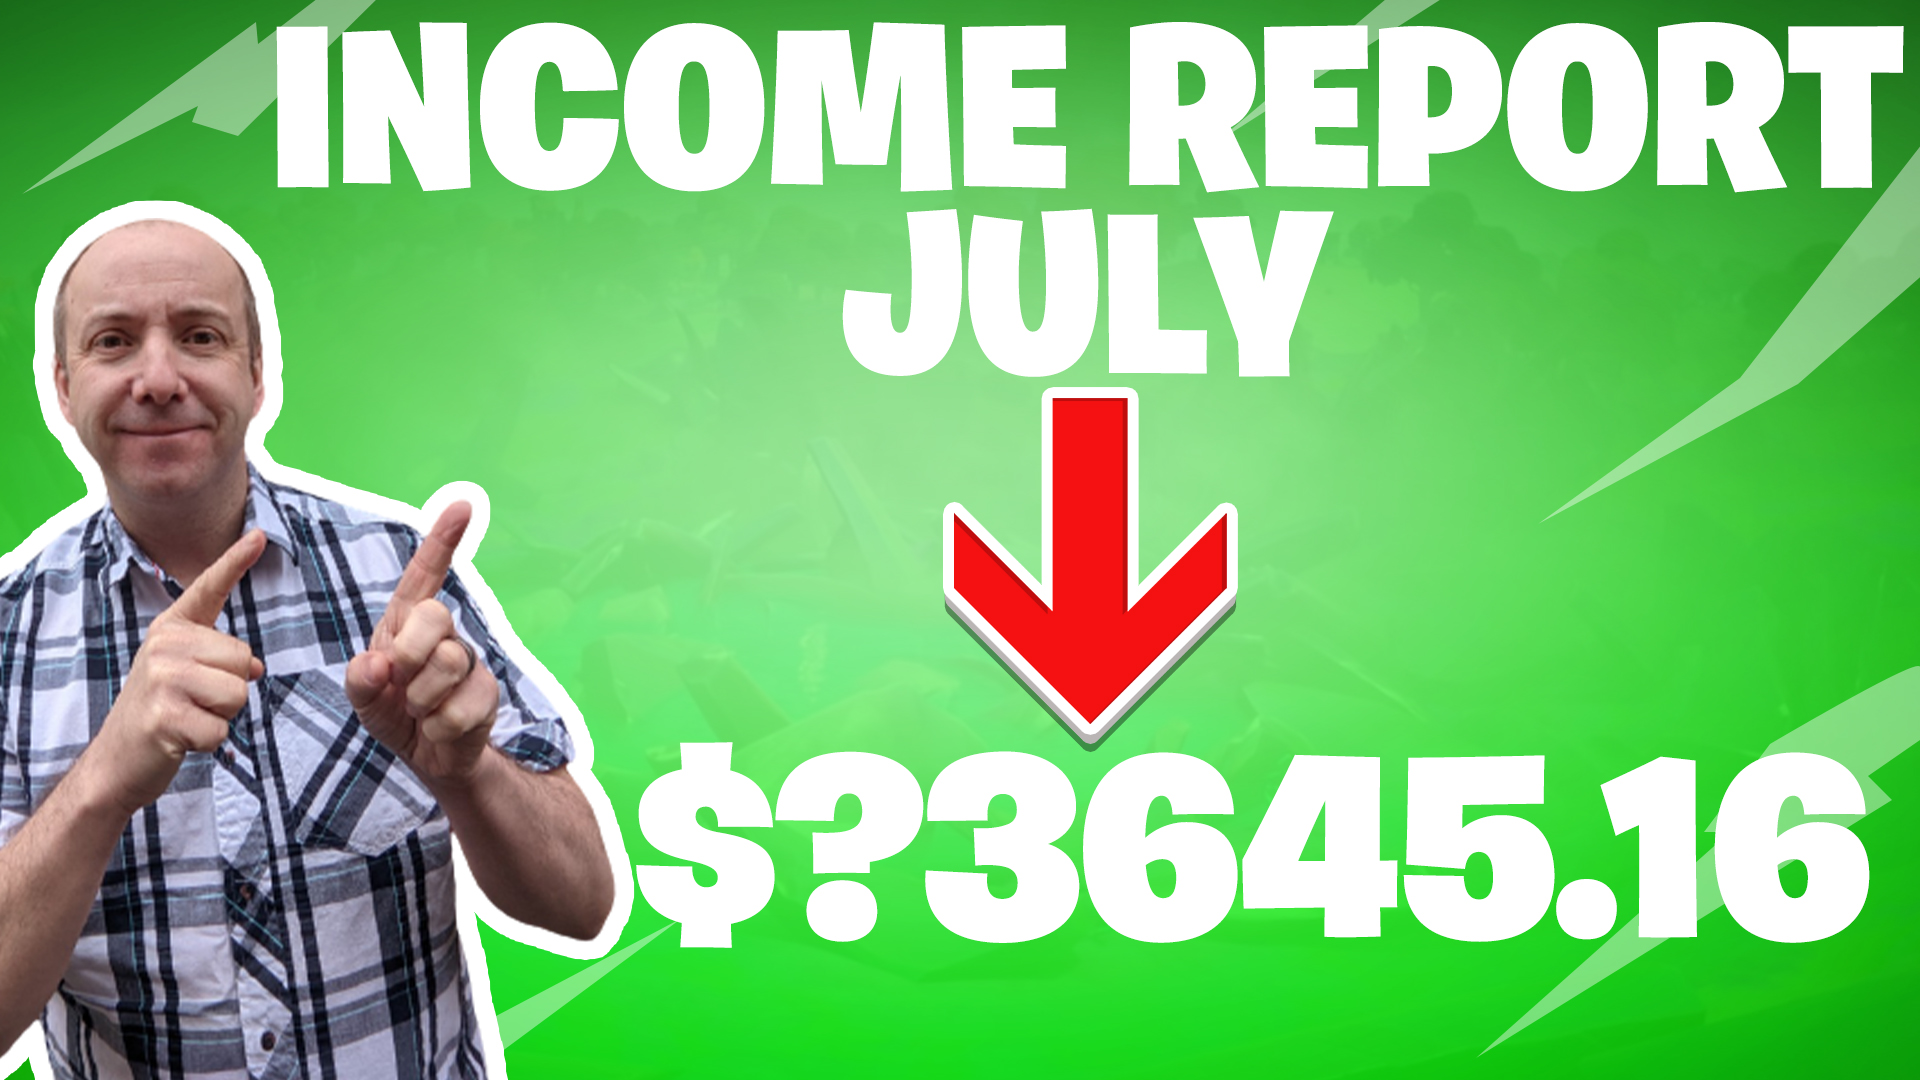 blogging income report july 2021